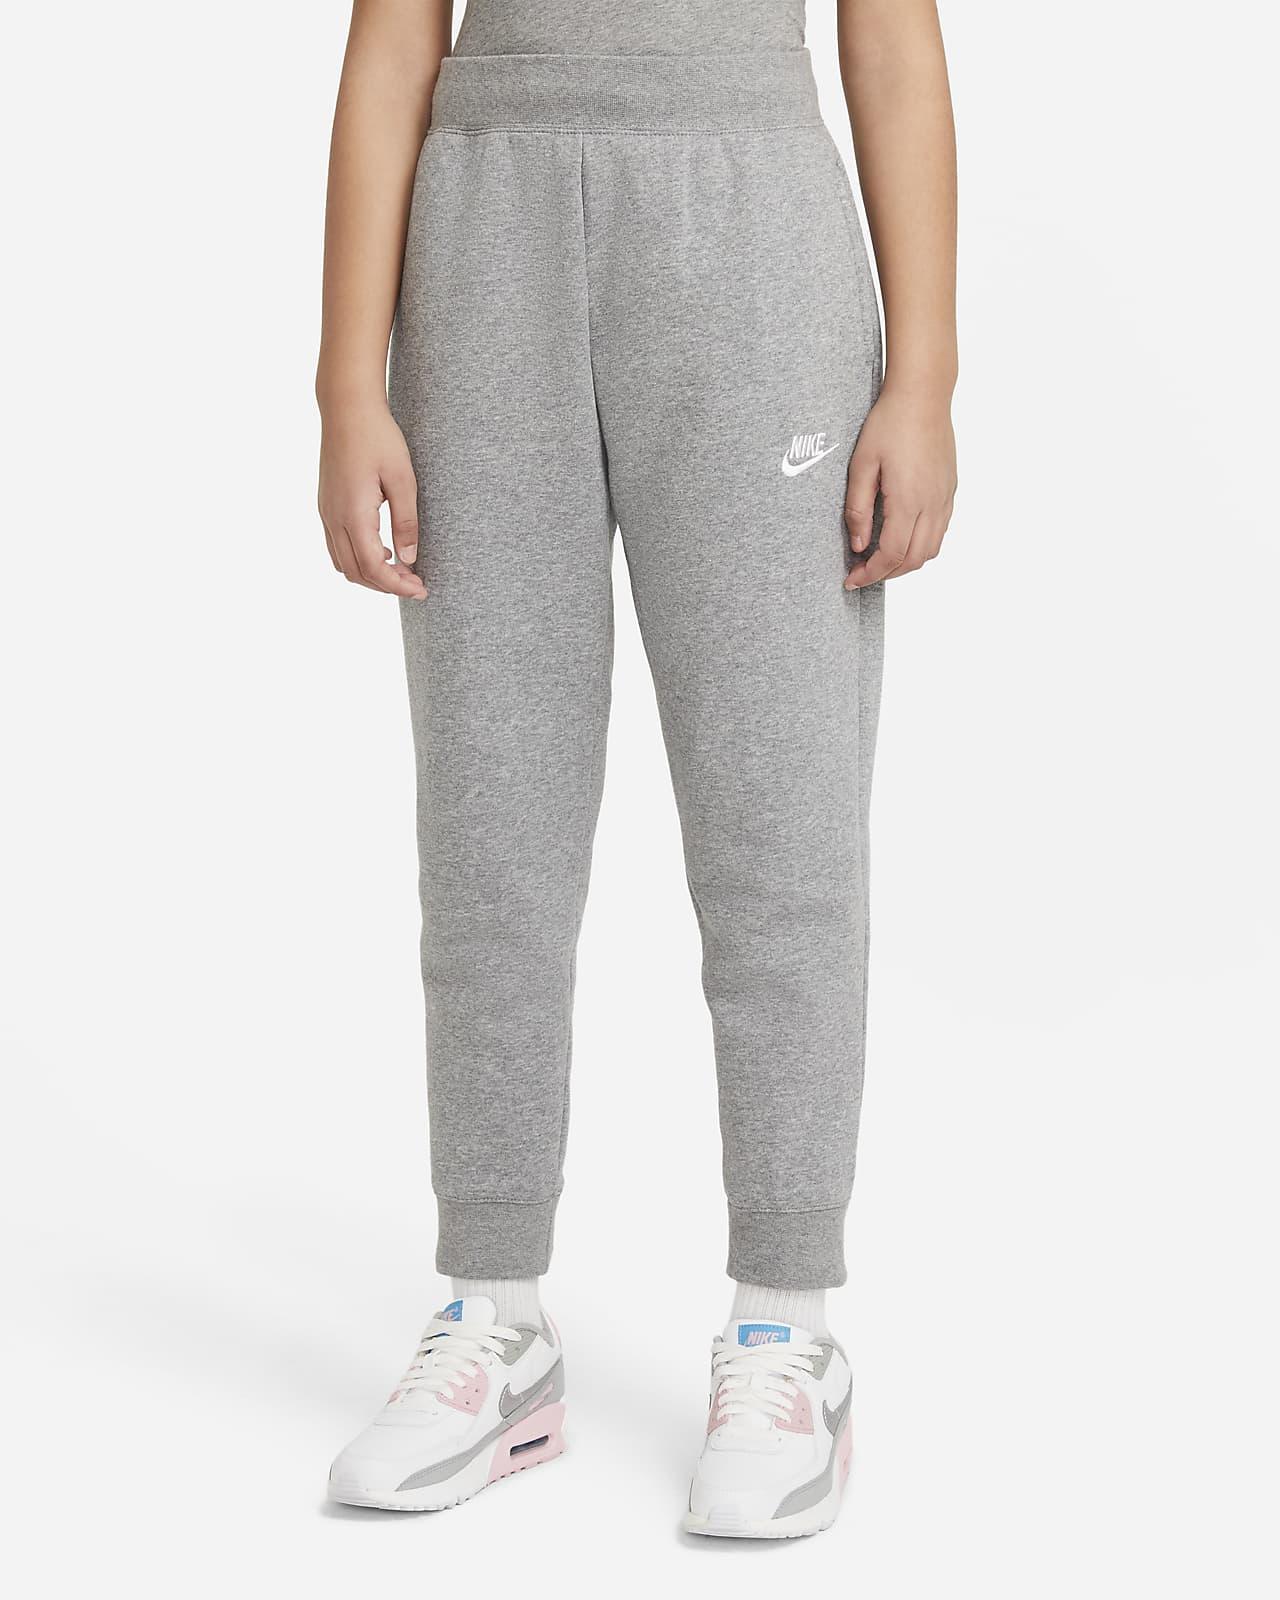 Pantaloni Nike Sportswear Club Fleece - Ragazza